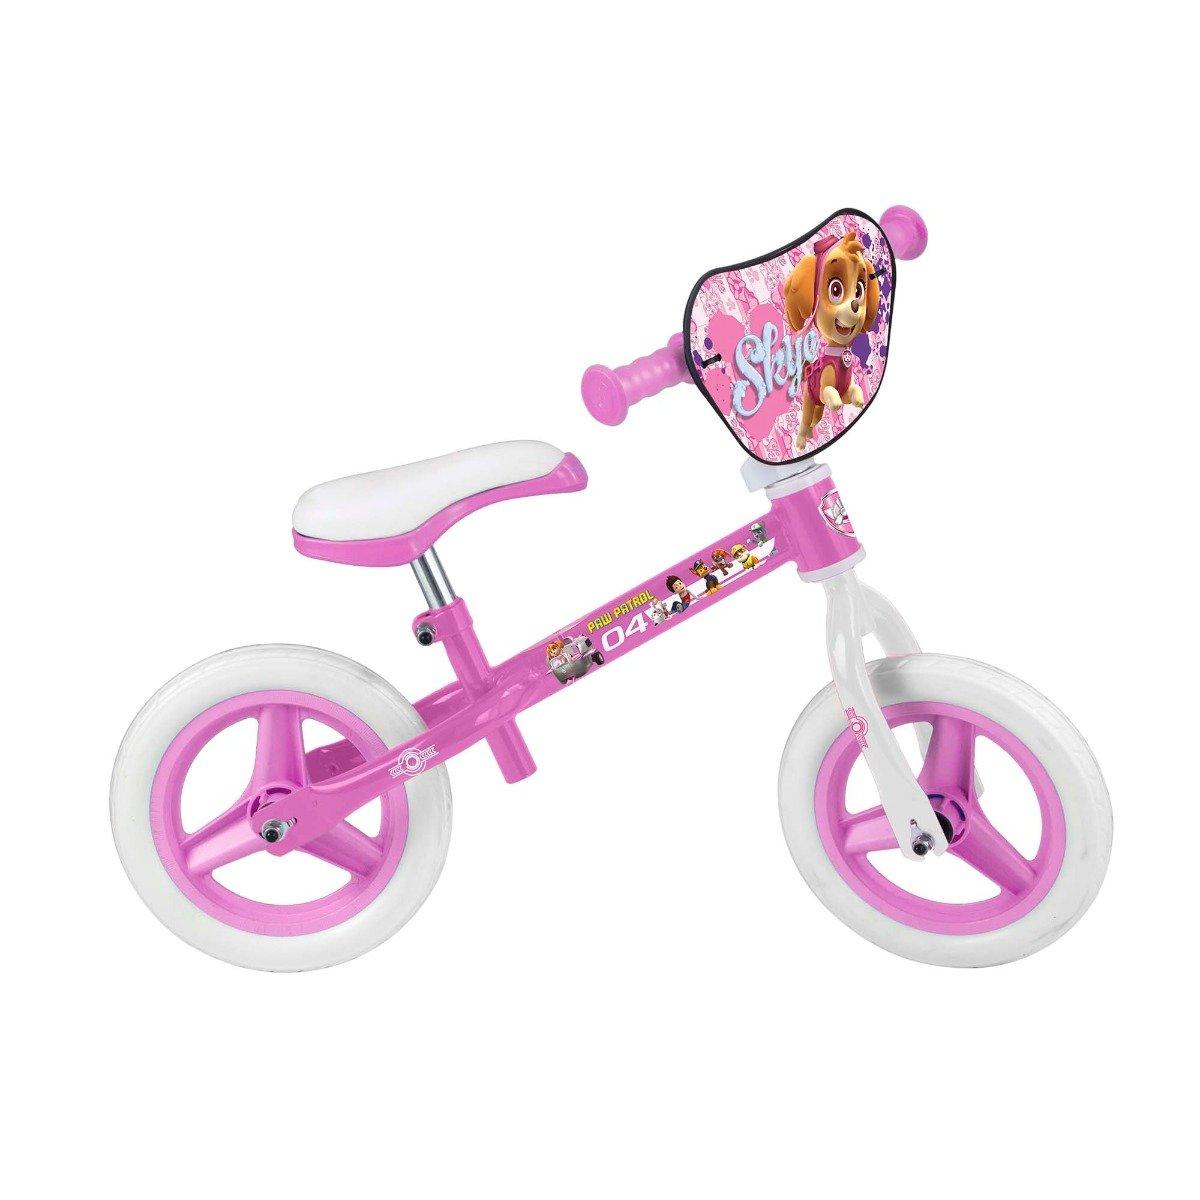 bicicleta fara pedale paw patrol girl - 10 inch